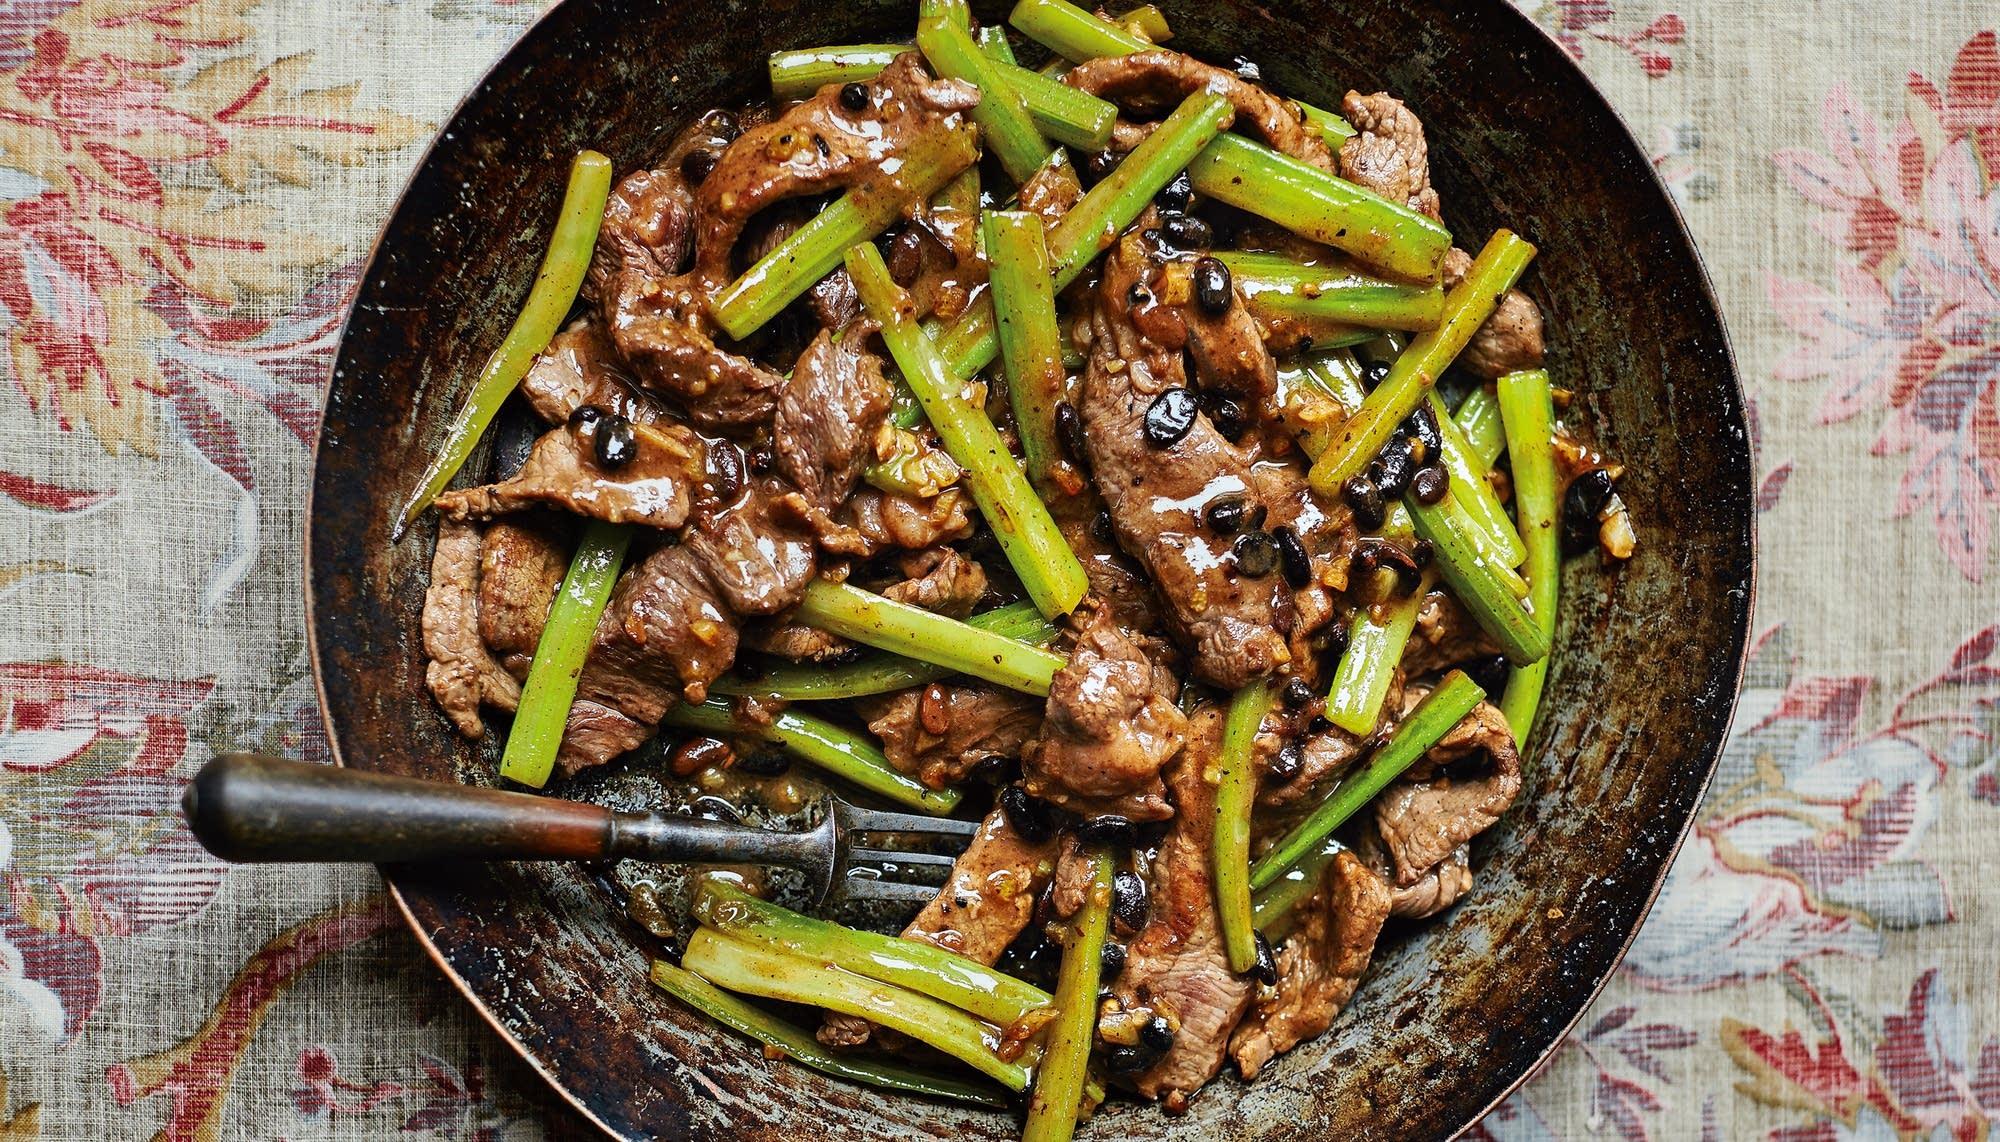 Stir-Fried Beef and Celery (Daging Lembu Dan Saderi) | The Splendid Table